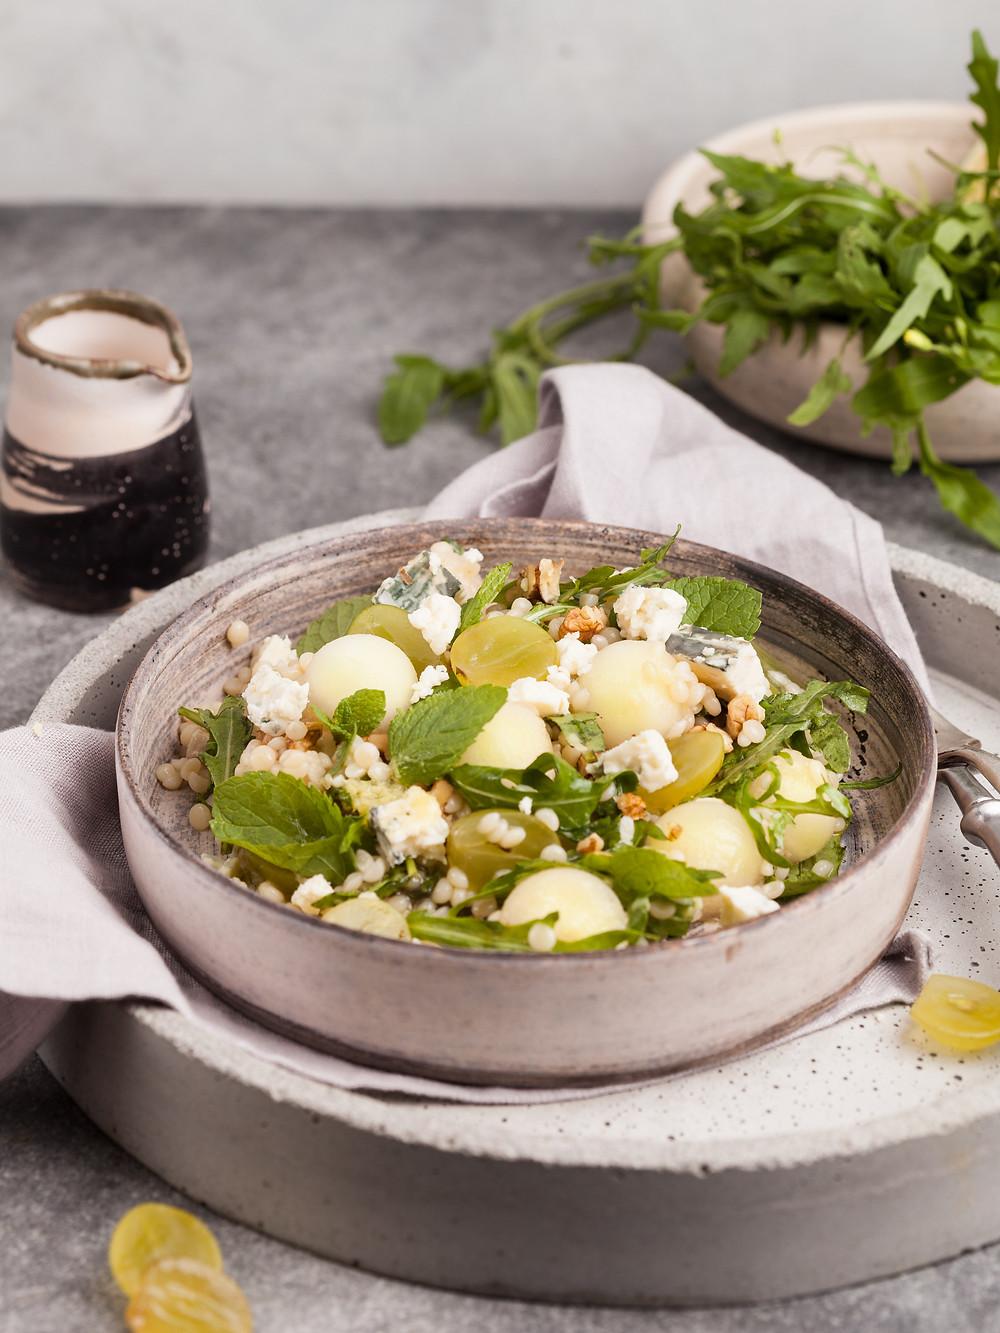 Plant based salad